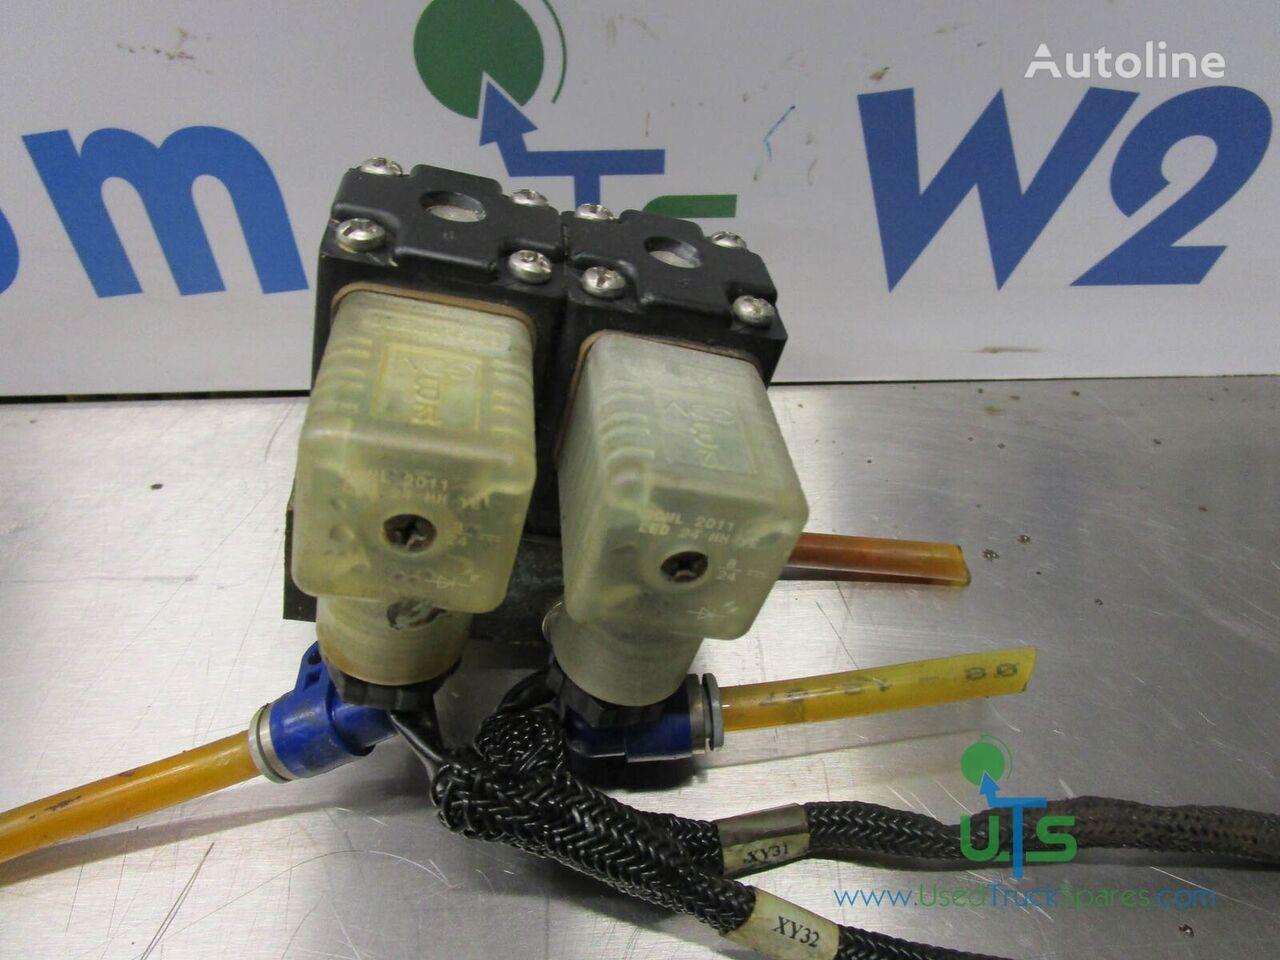 SWINGO 200 SOLENOID pneumatik ventil til lastbil